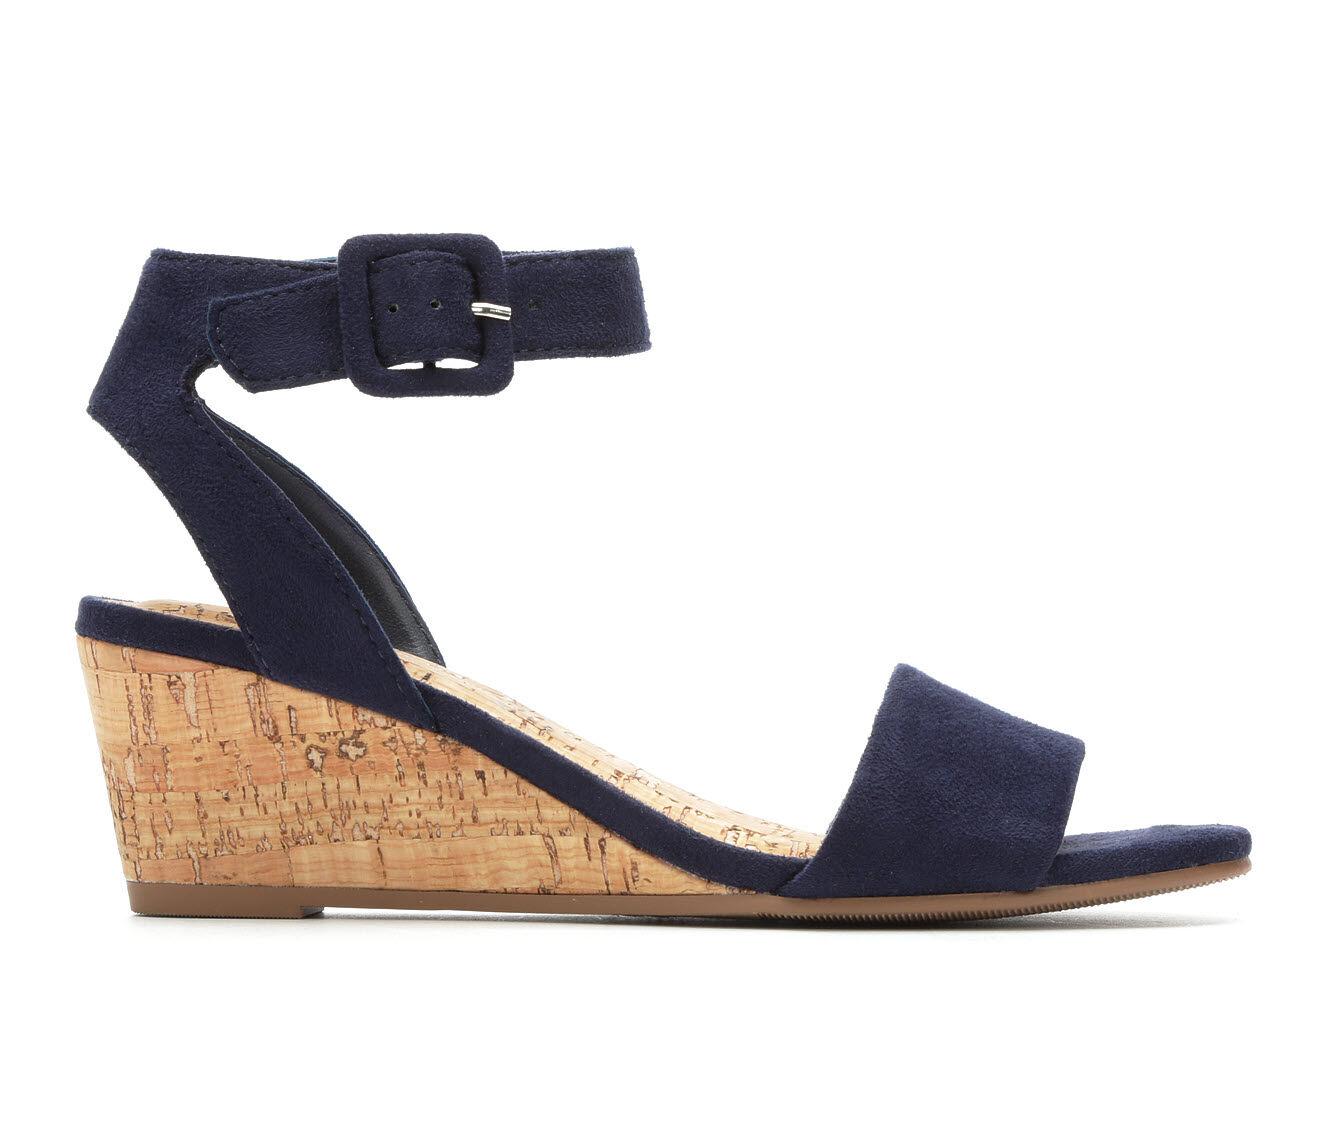 uk shoes_kd6409